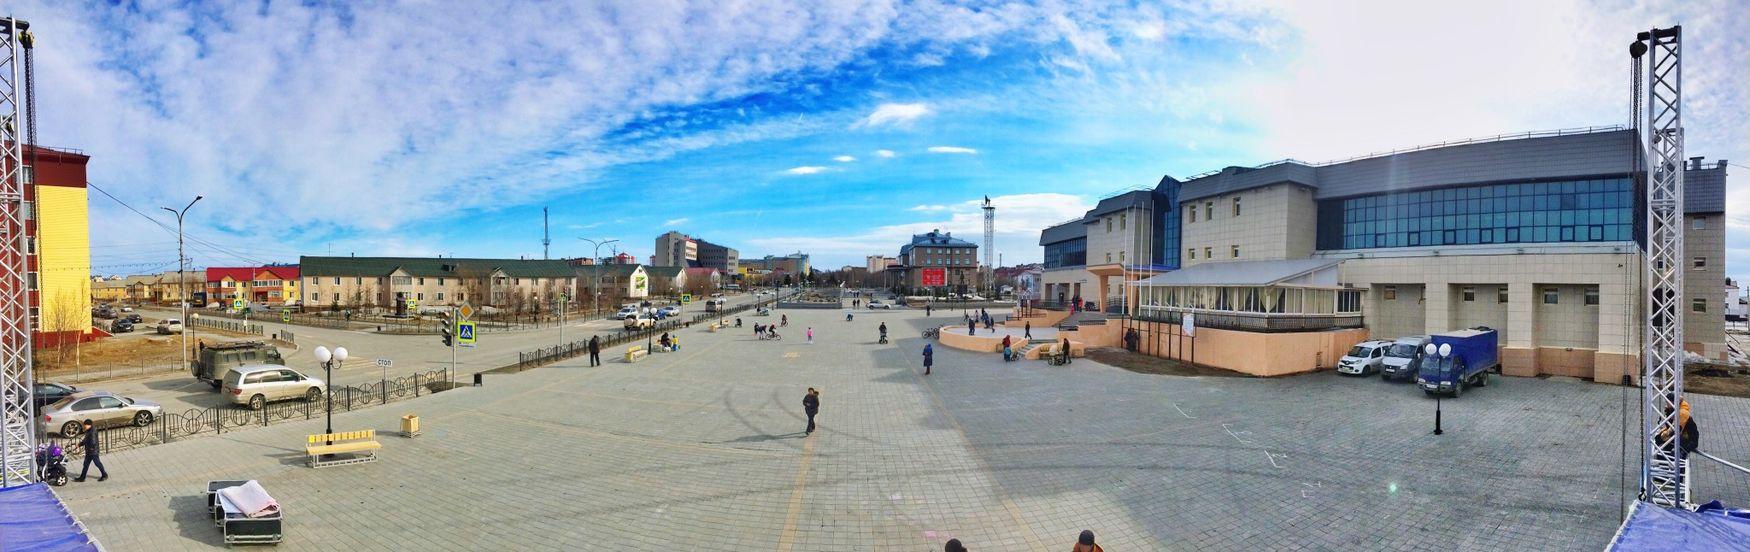 площадь Hi! Russia Yamal север Shd2day Yanao